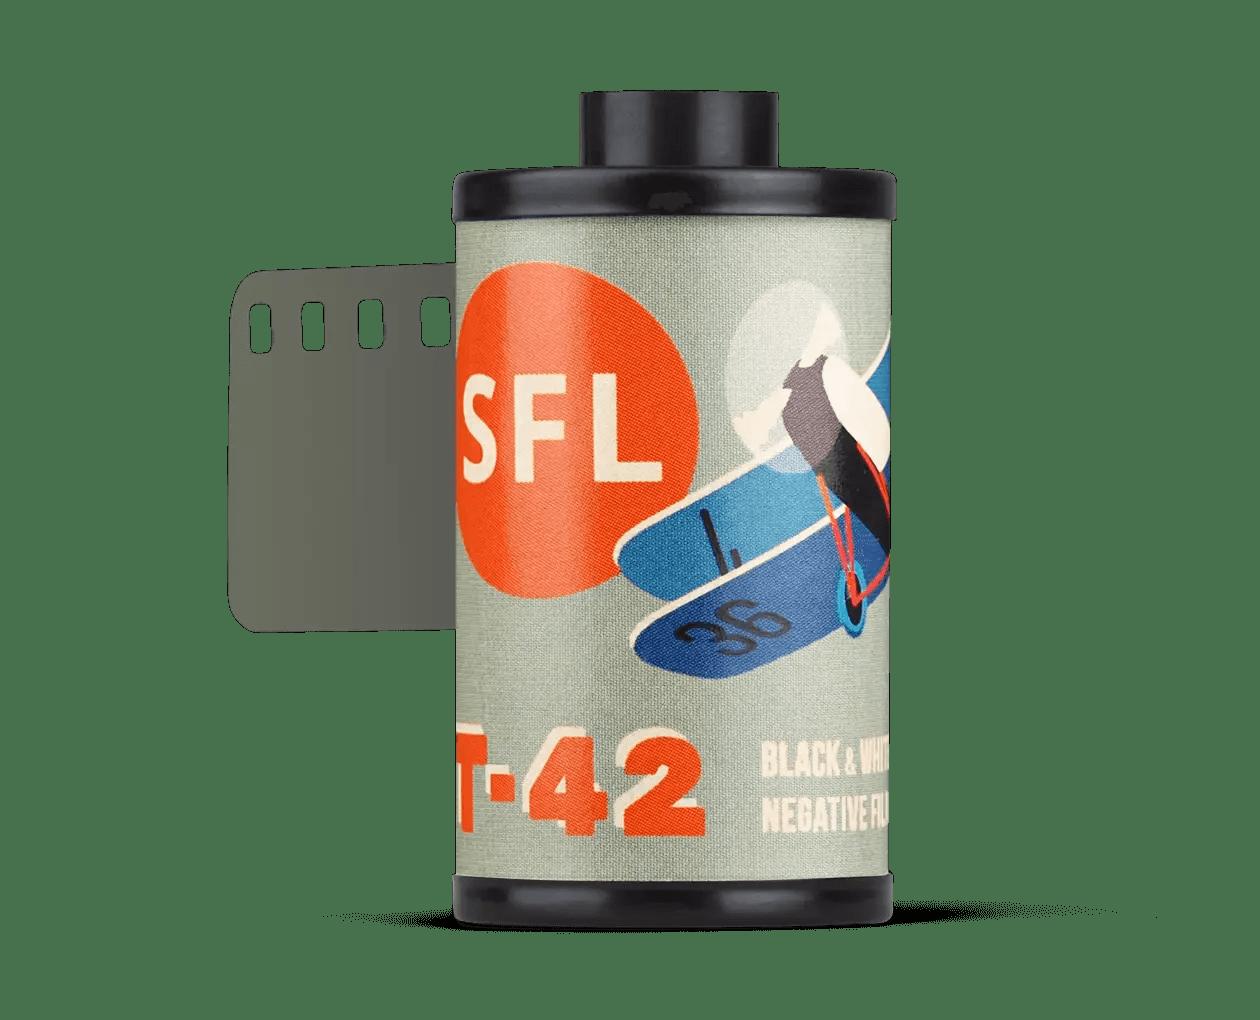 SREDA SFL Type 42. Credit: kosmofoto.com